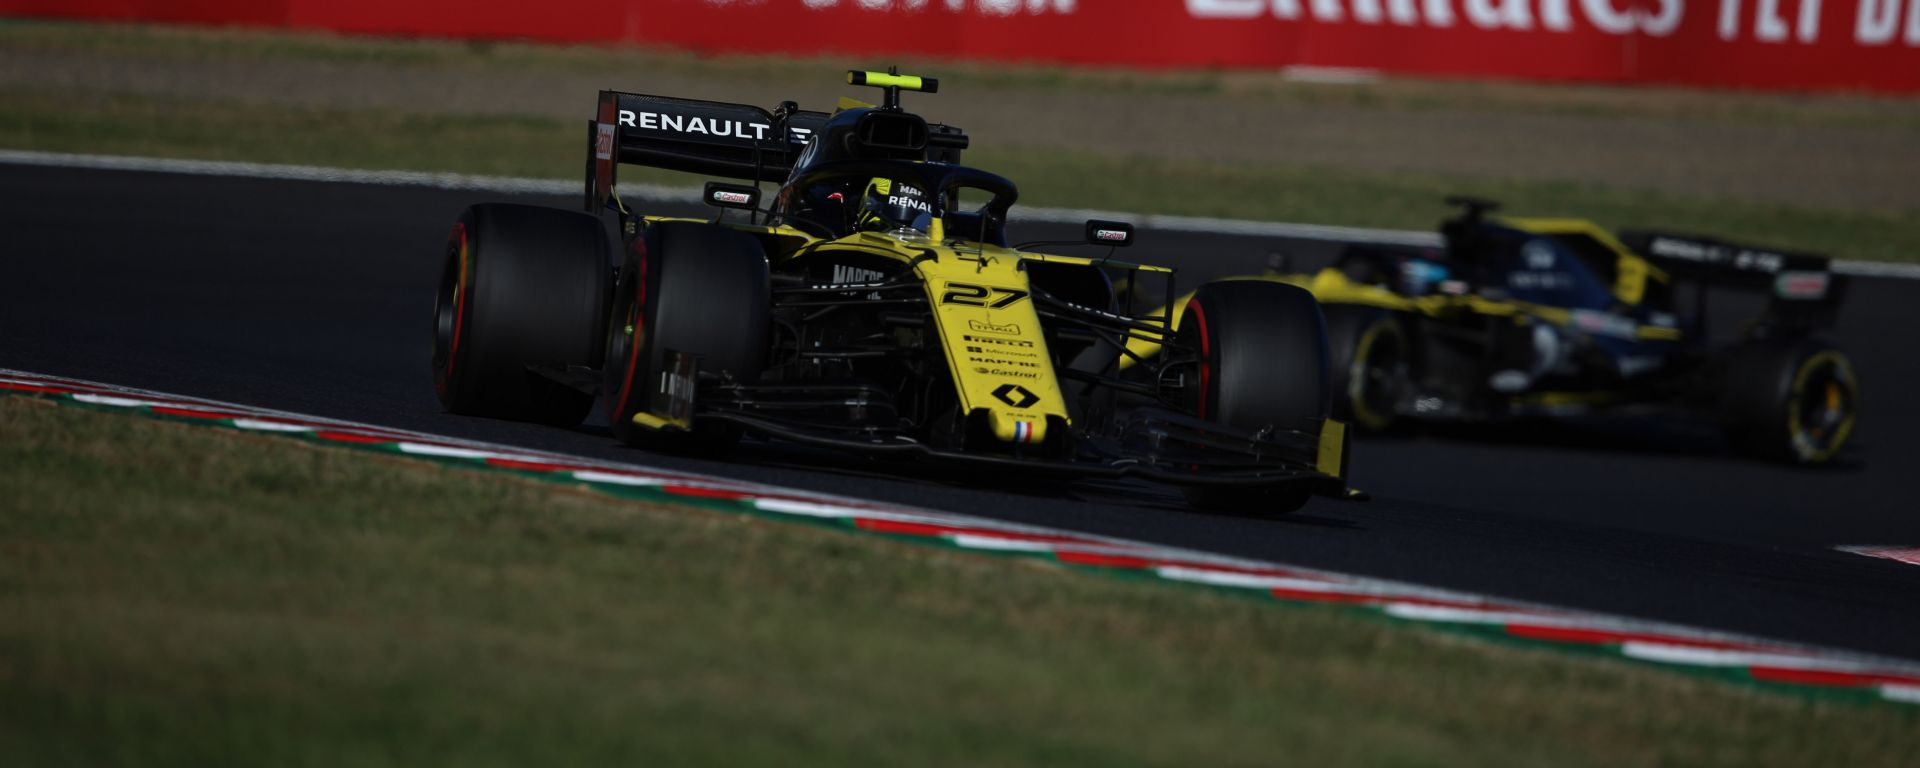 F1 GP Giappone 2019, Suzuka, Nico Hulkenberg e Daniel Ricciardo (Renault)